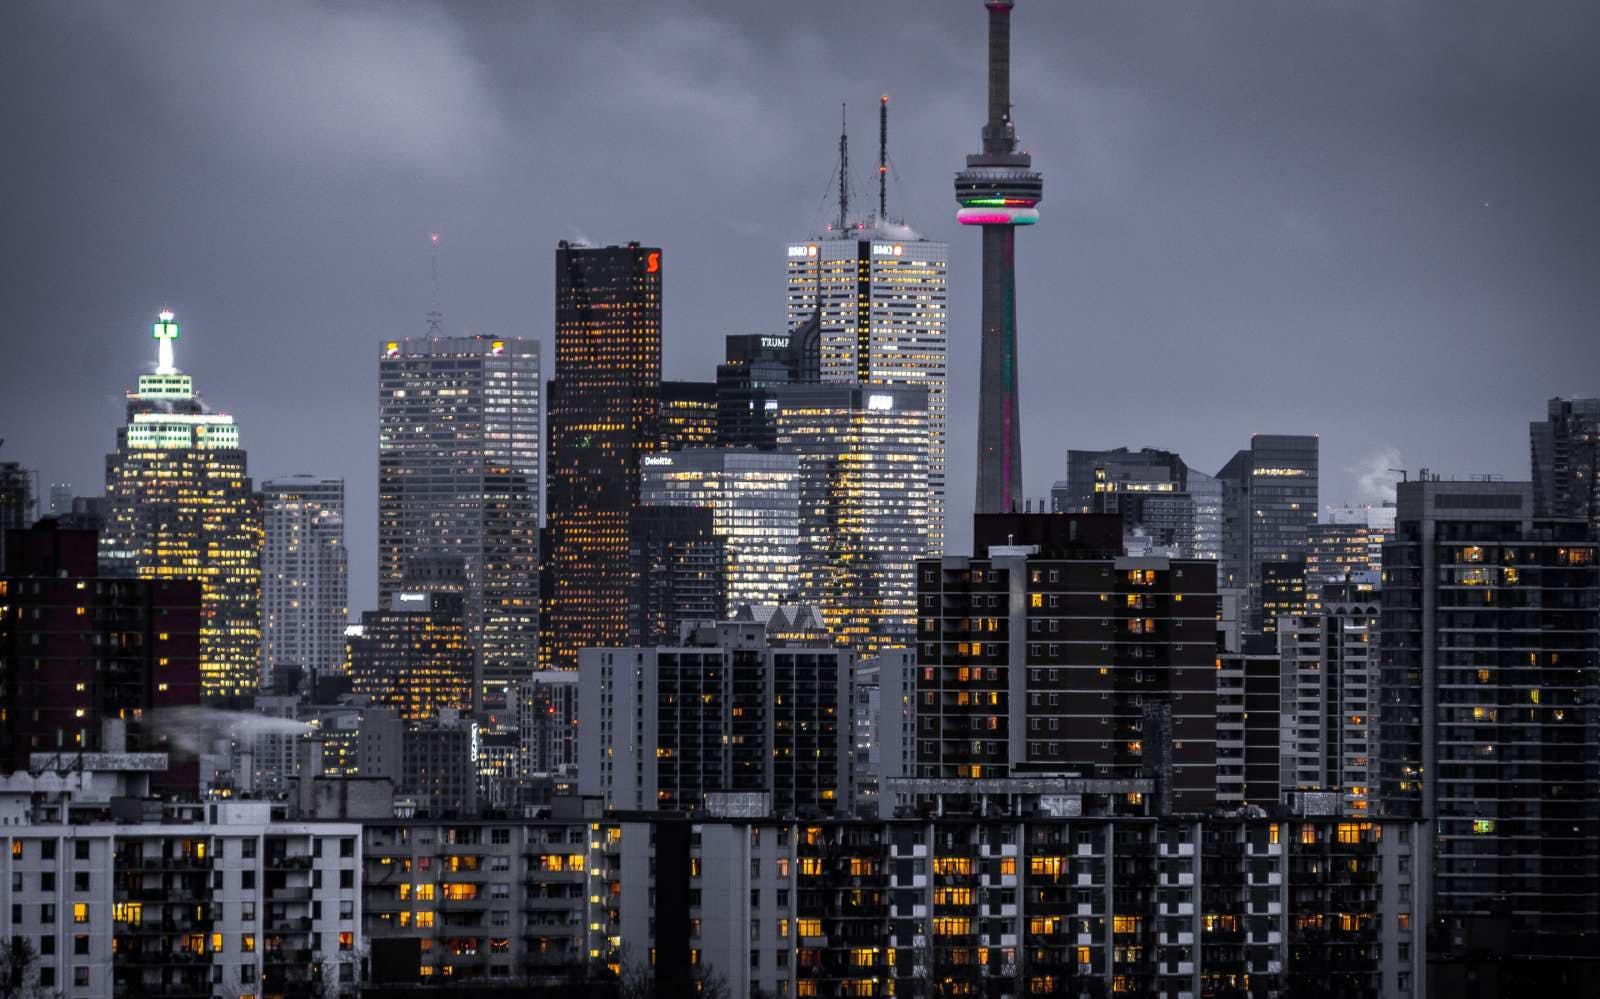 Toronto image